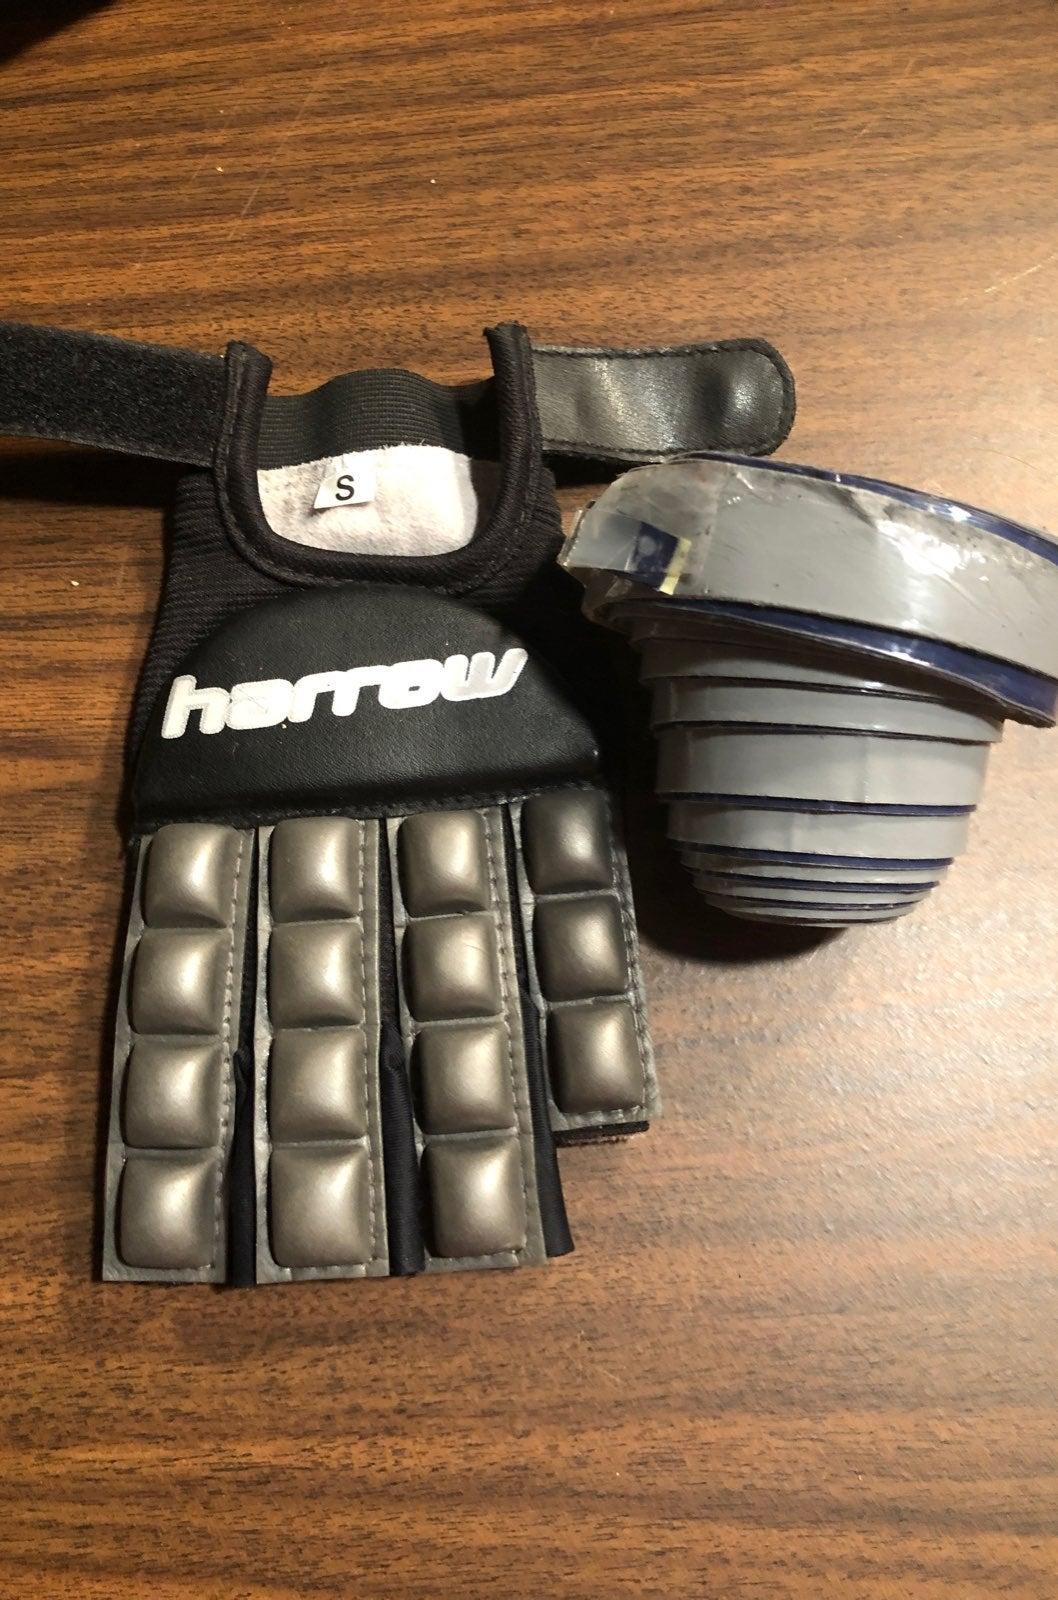 Harrow indoor field hockey glove & tape